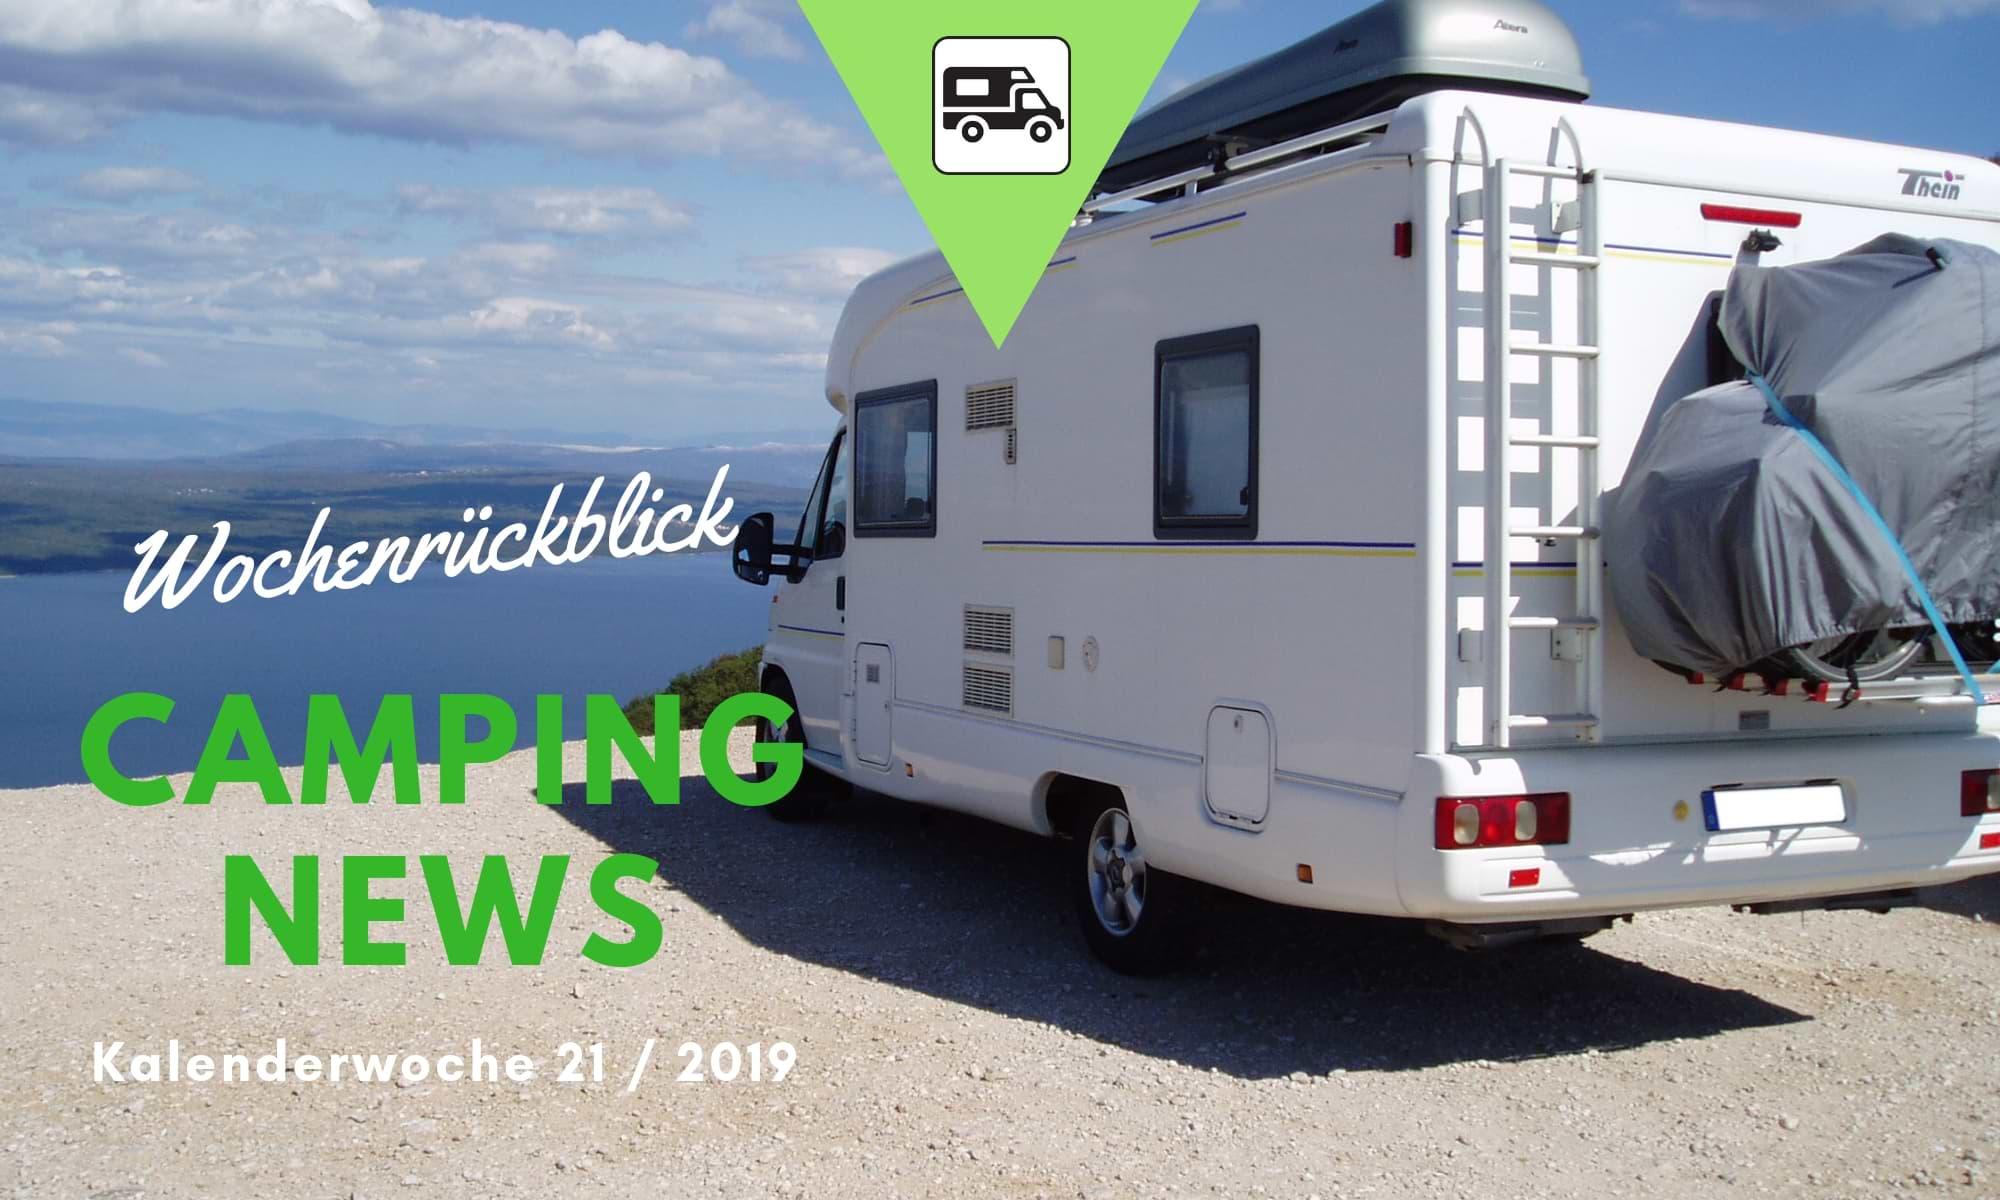 Wochenrückblick Camping News KW21-2019